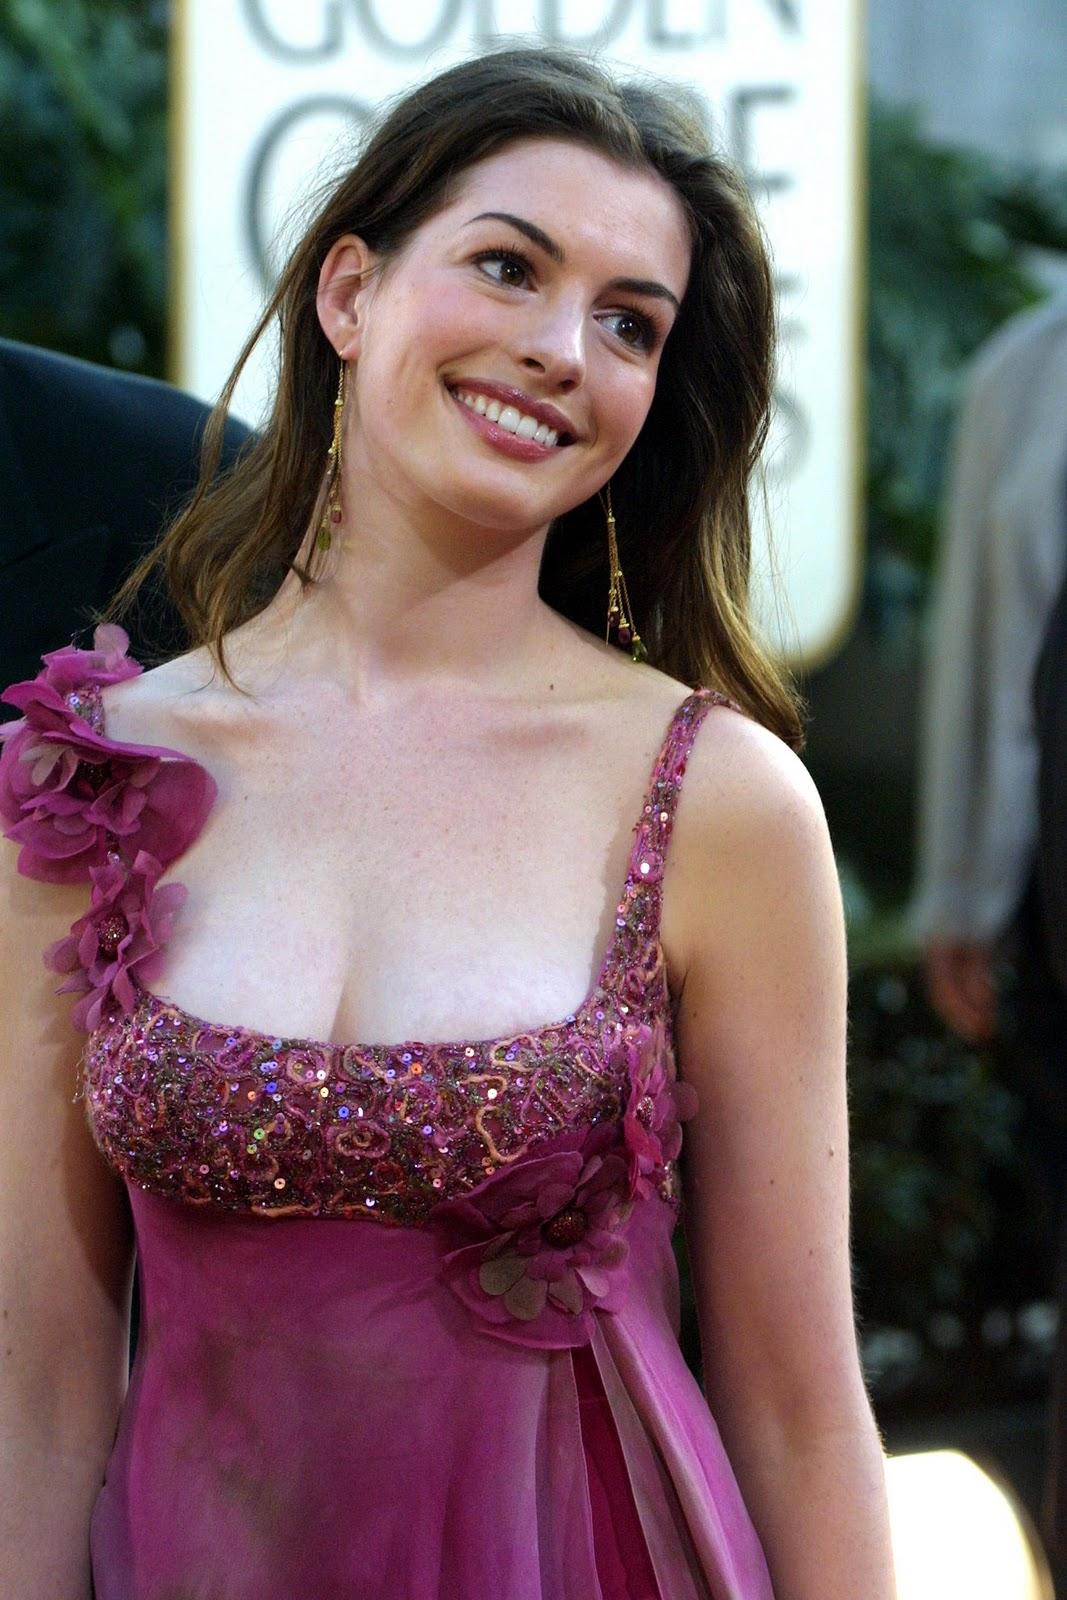 Celebrity Hairstyles Anne Hathaway 2013 Hair Trends